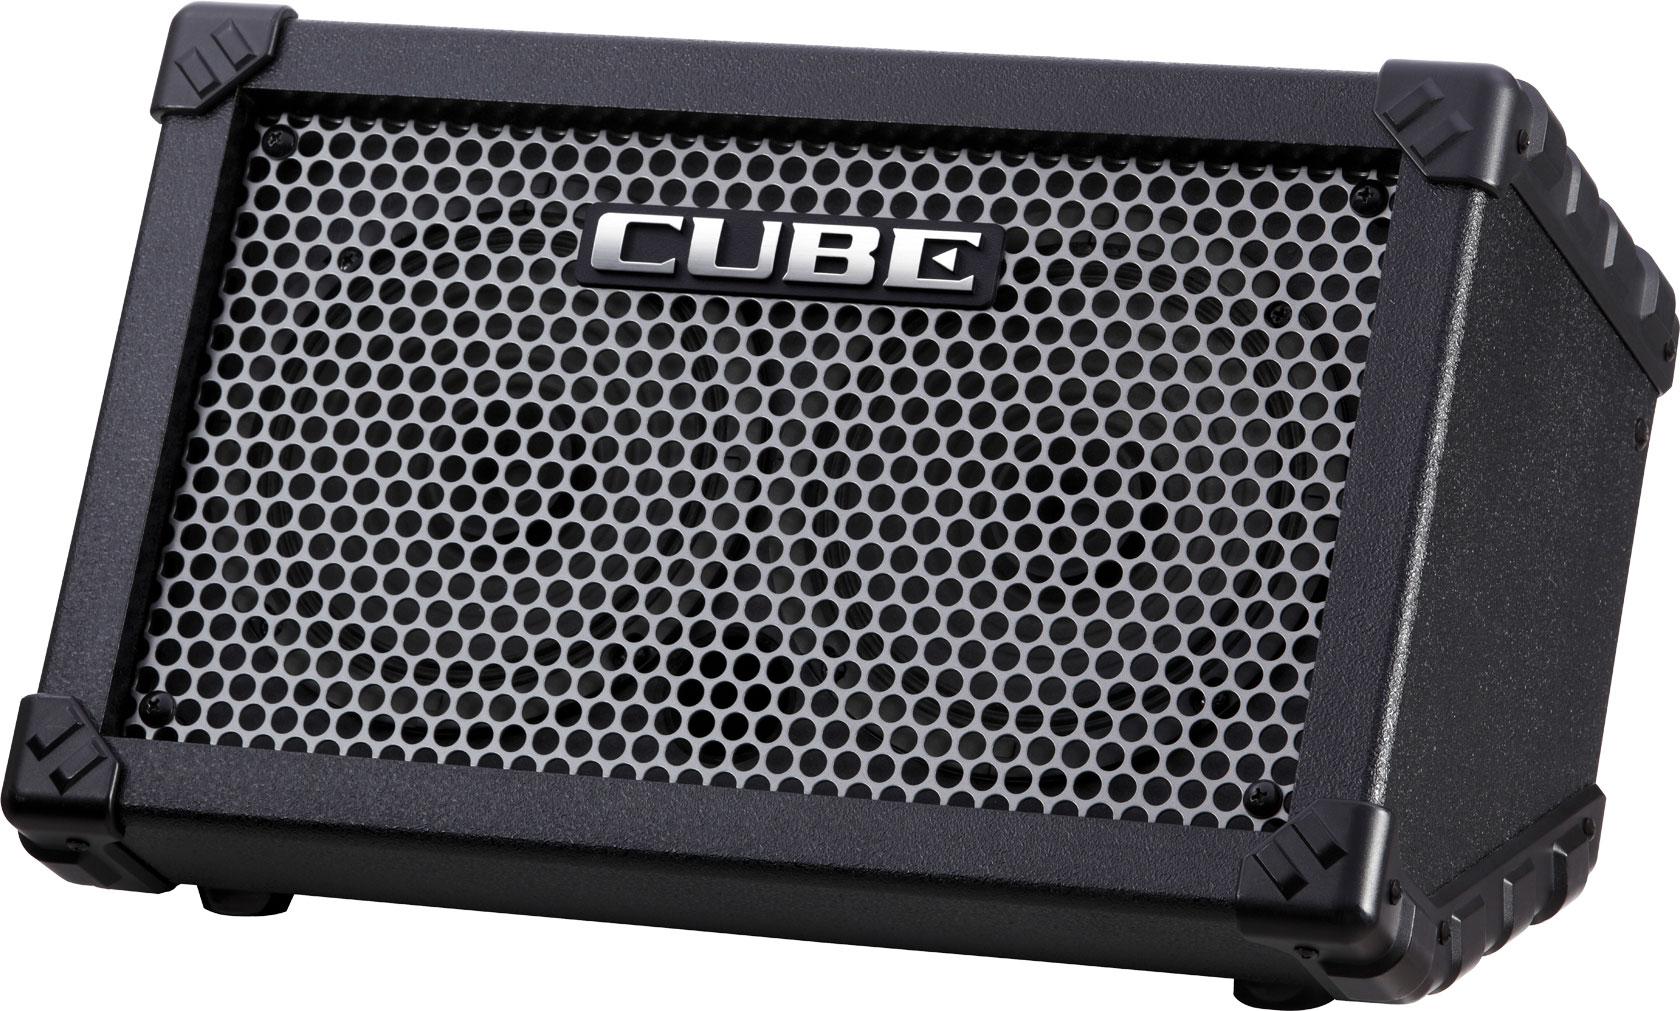 Roland Cube Street Battery Powered Guitar Combo Amplifier 5W